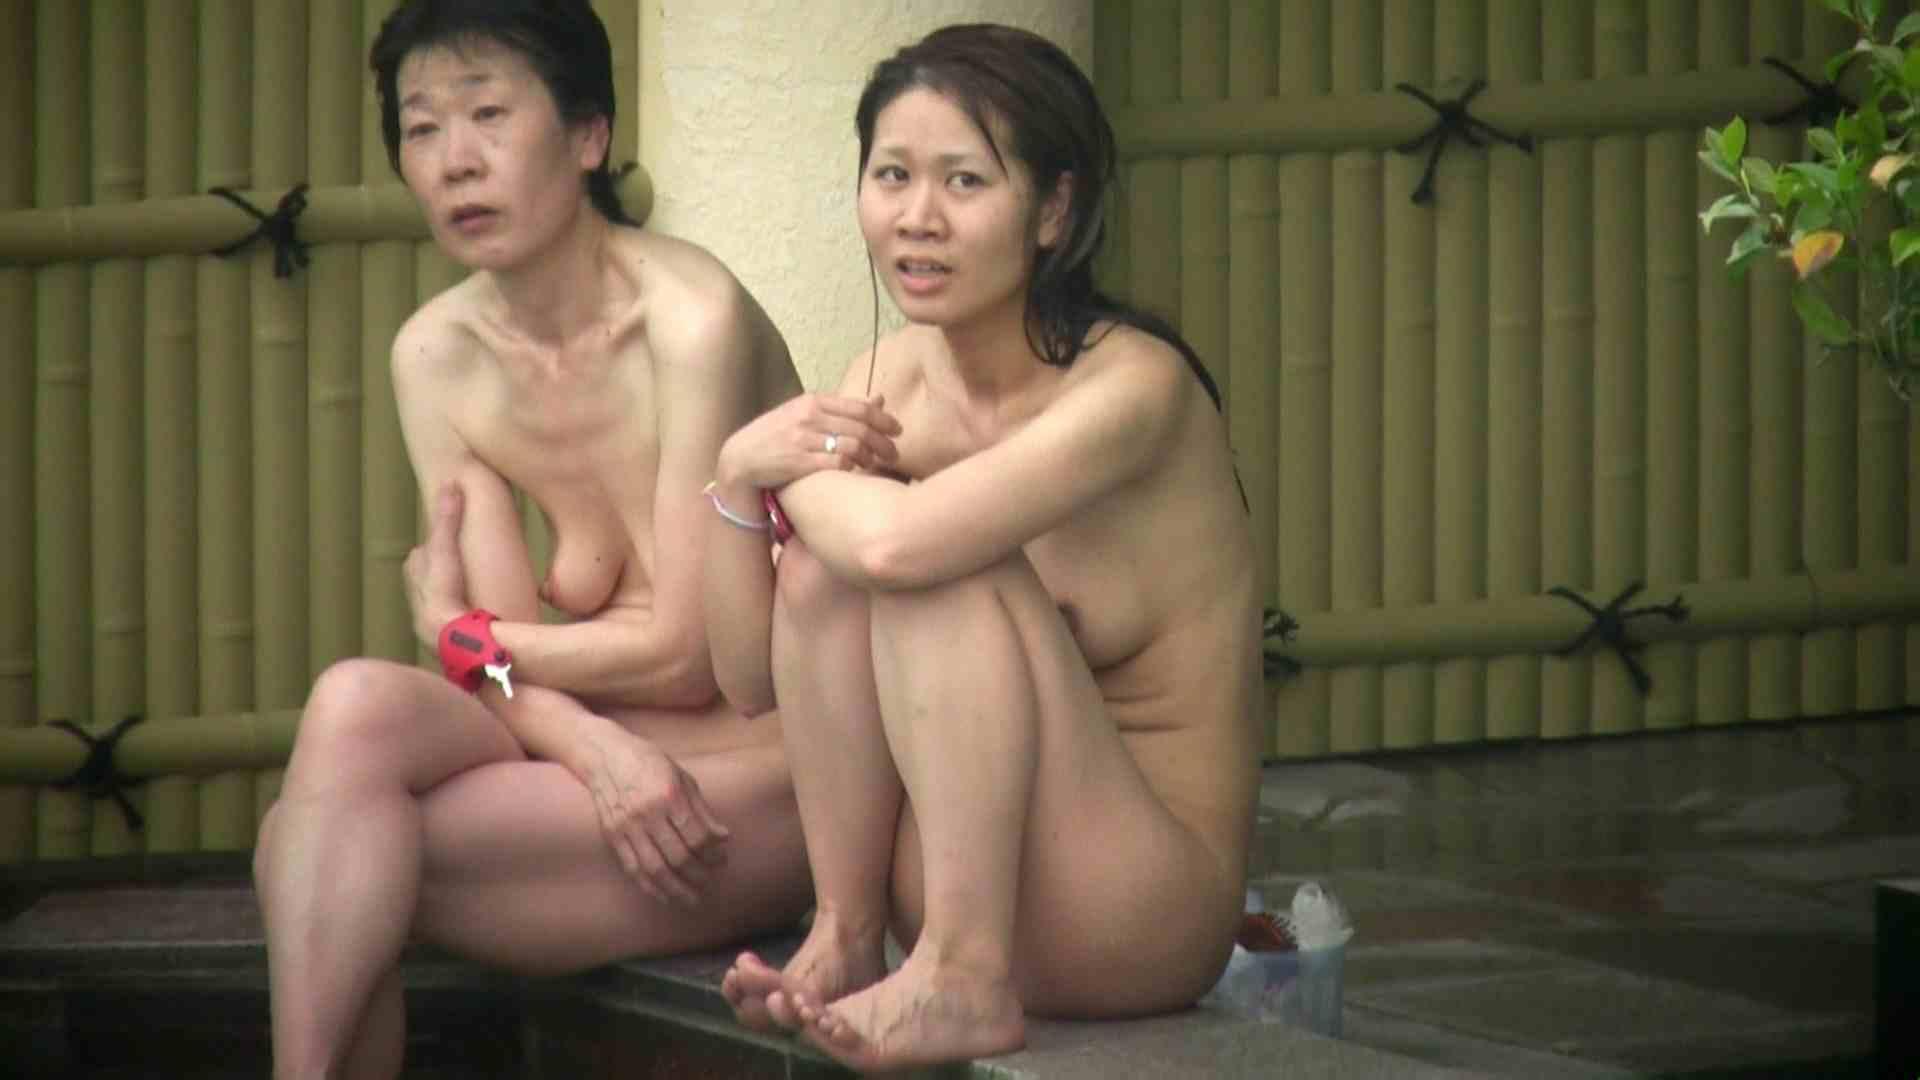 Aquaな露天風呂Vol.07 露天風呂 エロ無料画像 111連発 92